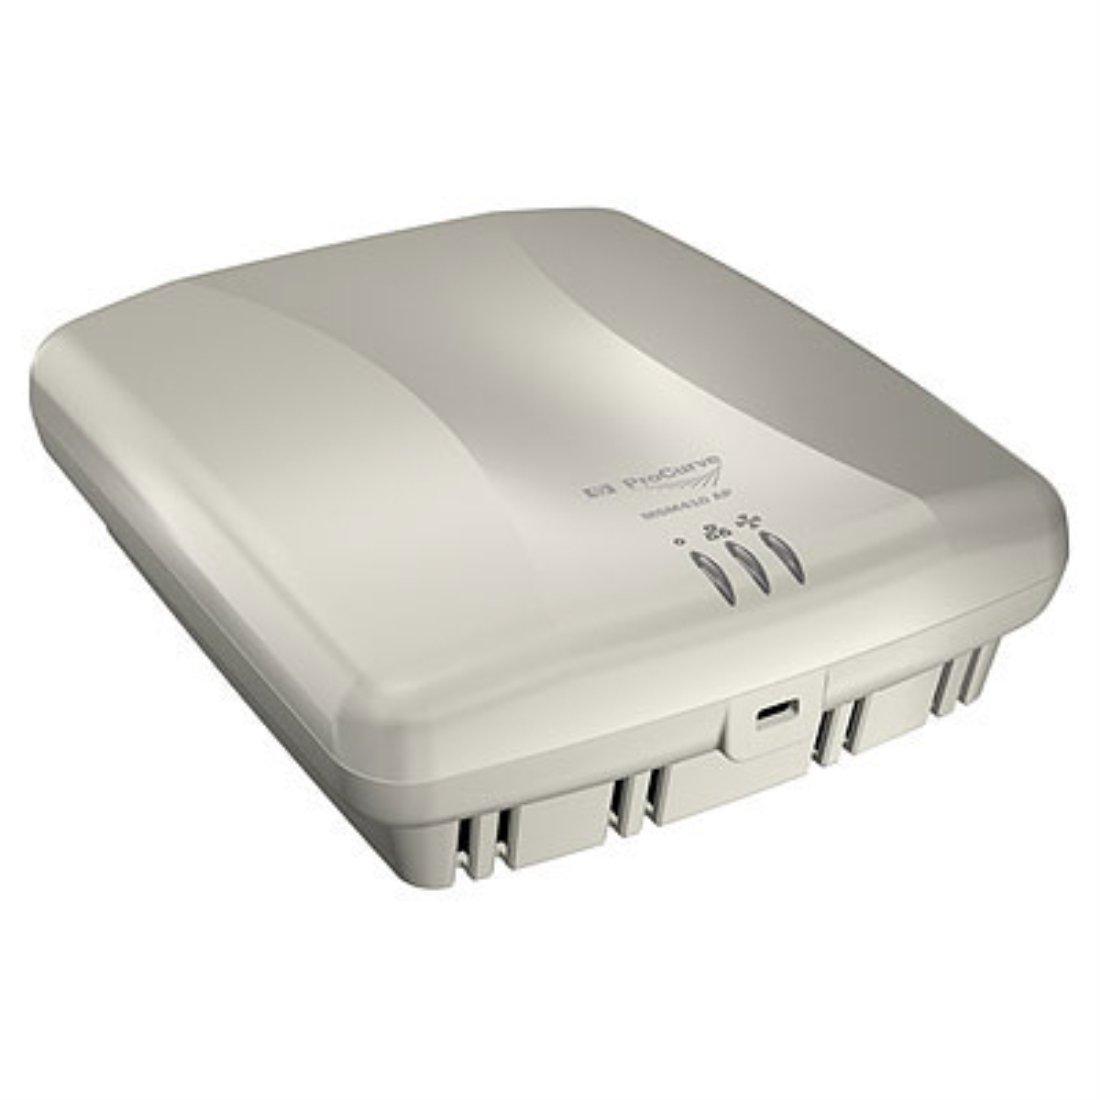 Point d'acc�s WiFi HP PROCURVE MSM410 beige